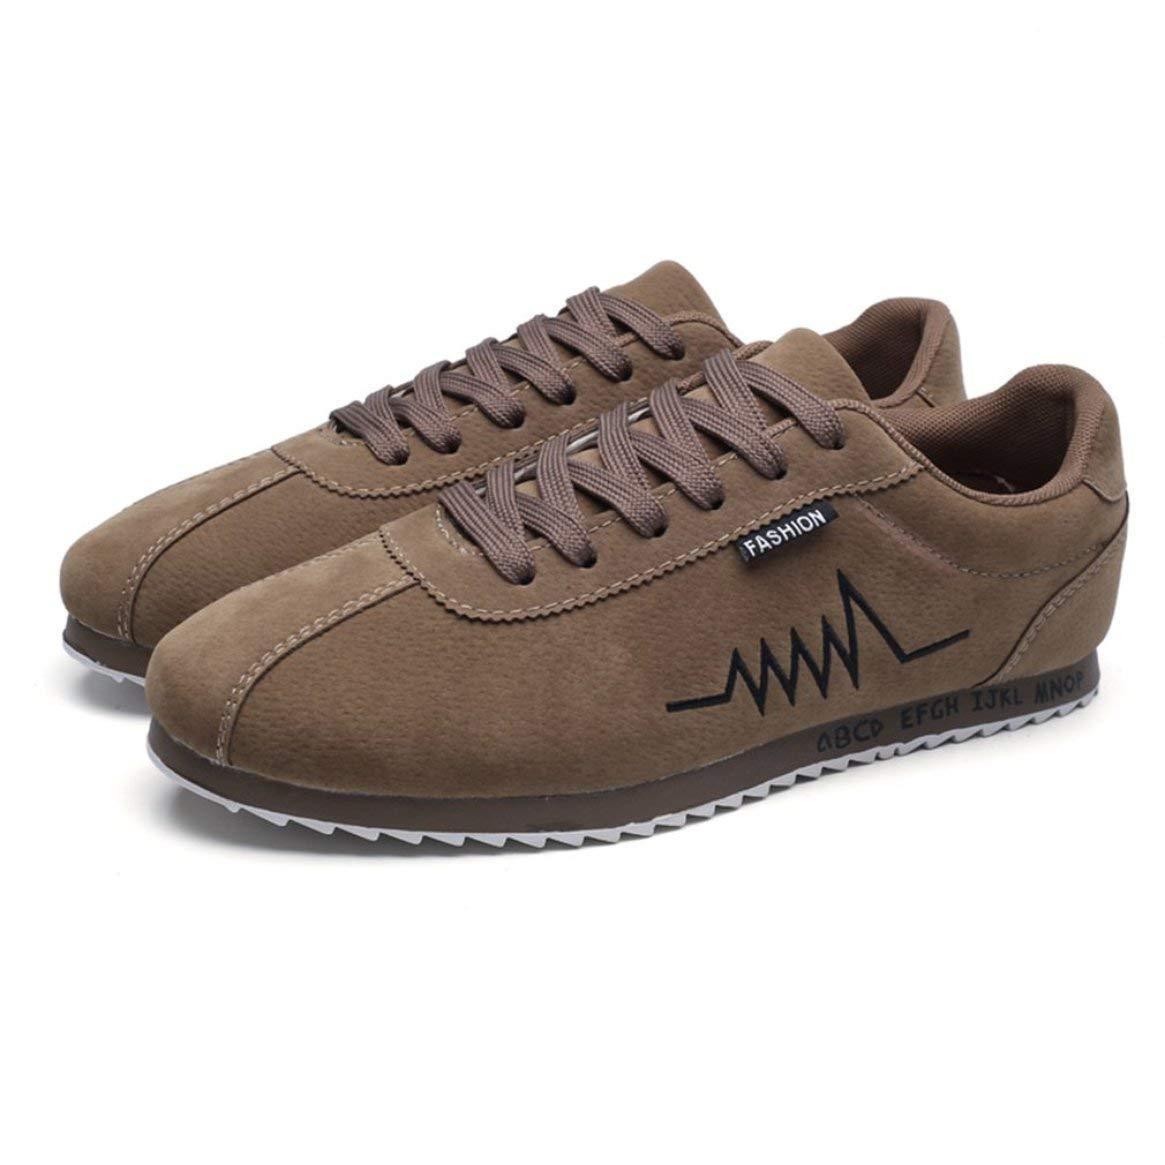 Moda Caminar para Hombres Zapatos para Caminar Moda Transpirable Malla Forro Zapatos Deportivos al Aire Libre Cómodos Zapatos Casuales Zapatillas Antideslizantes con Suela de Goma - Albaricoque 39 de6633